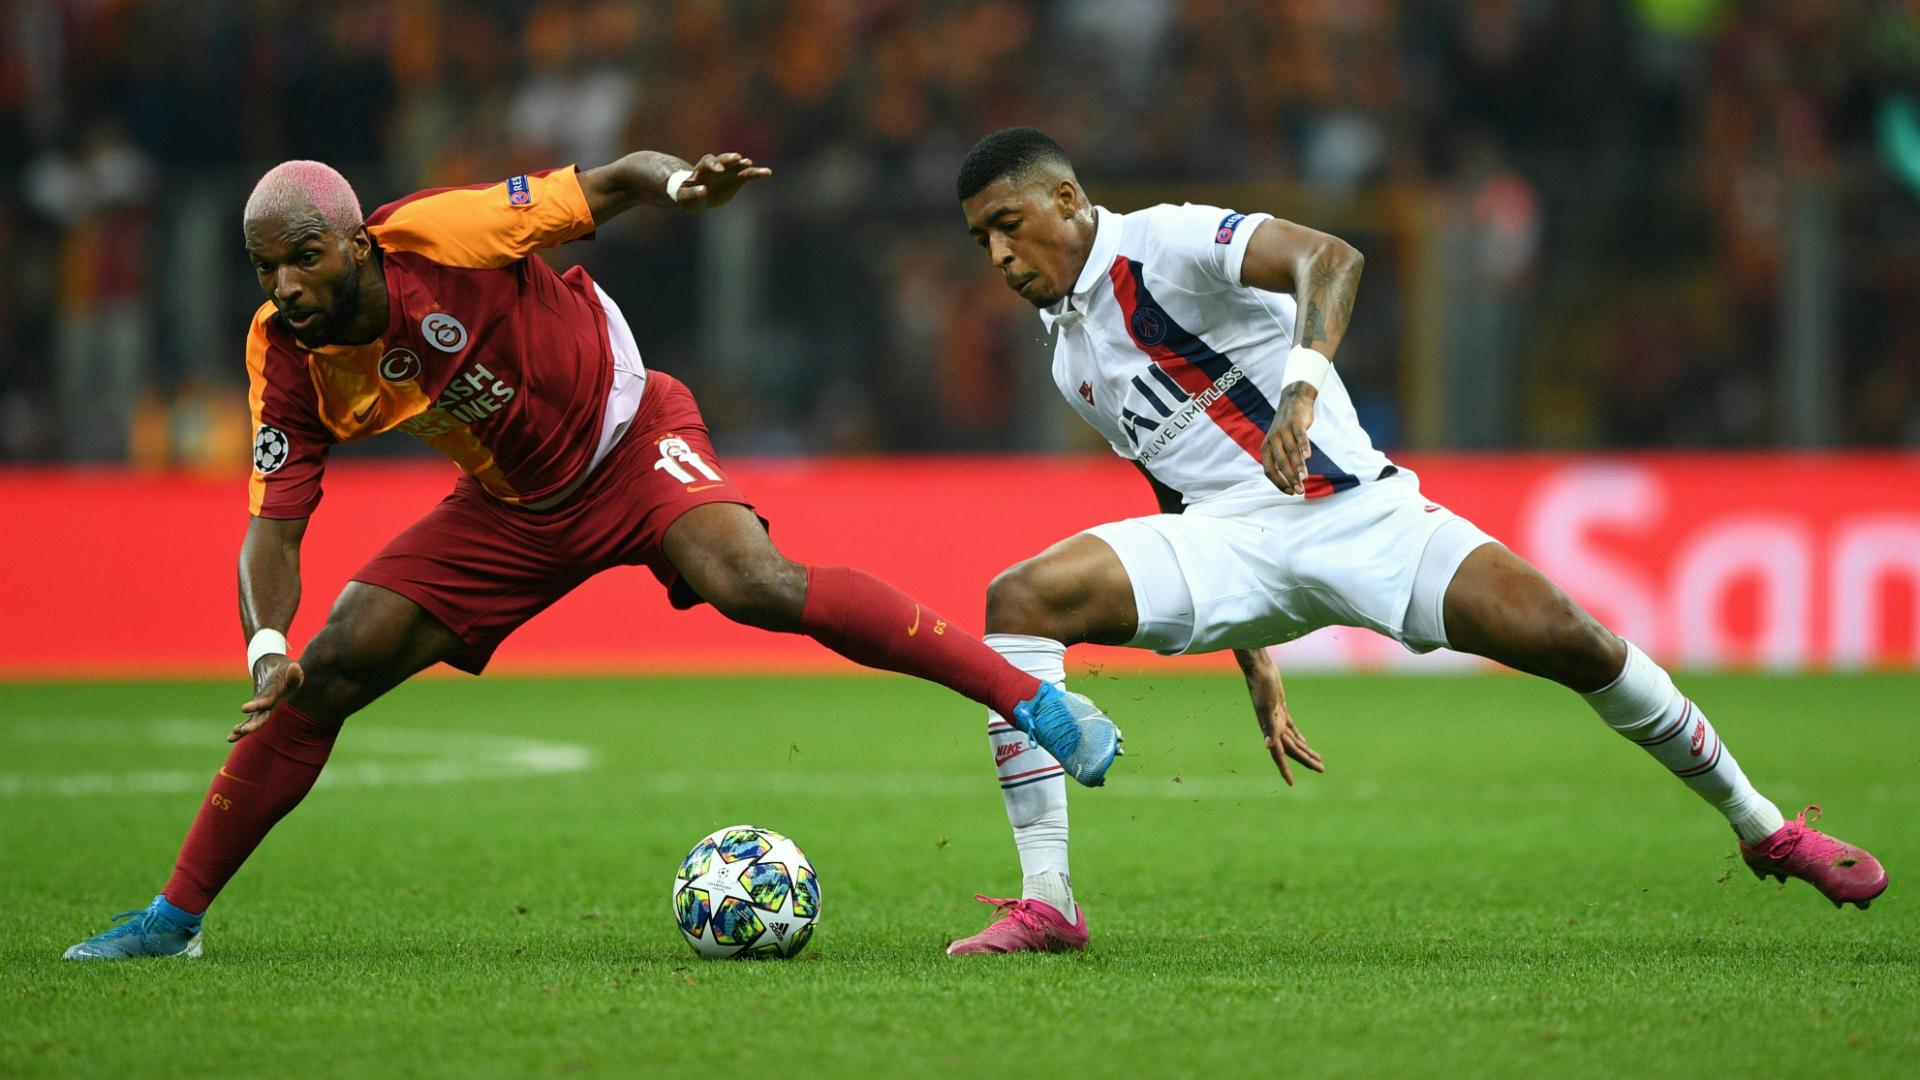 Ryan Babel Presnel Kimpembe Galatasaray PSG UCL 10012019